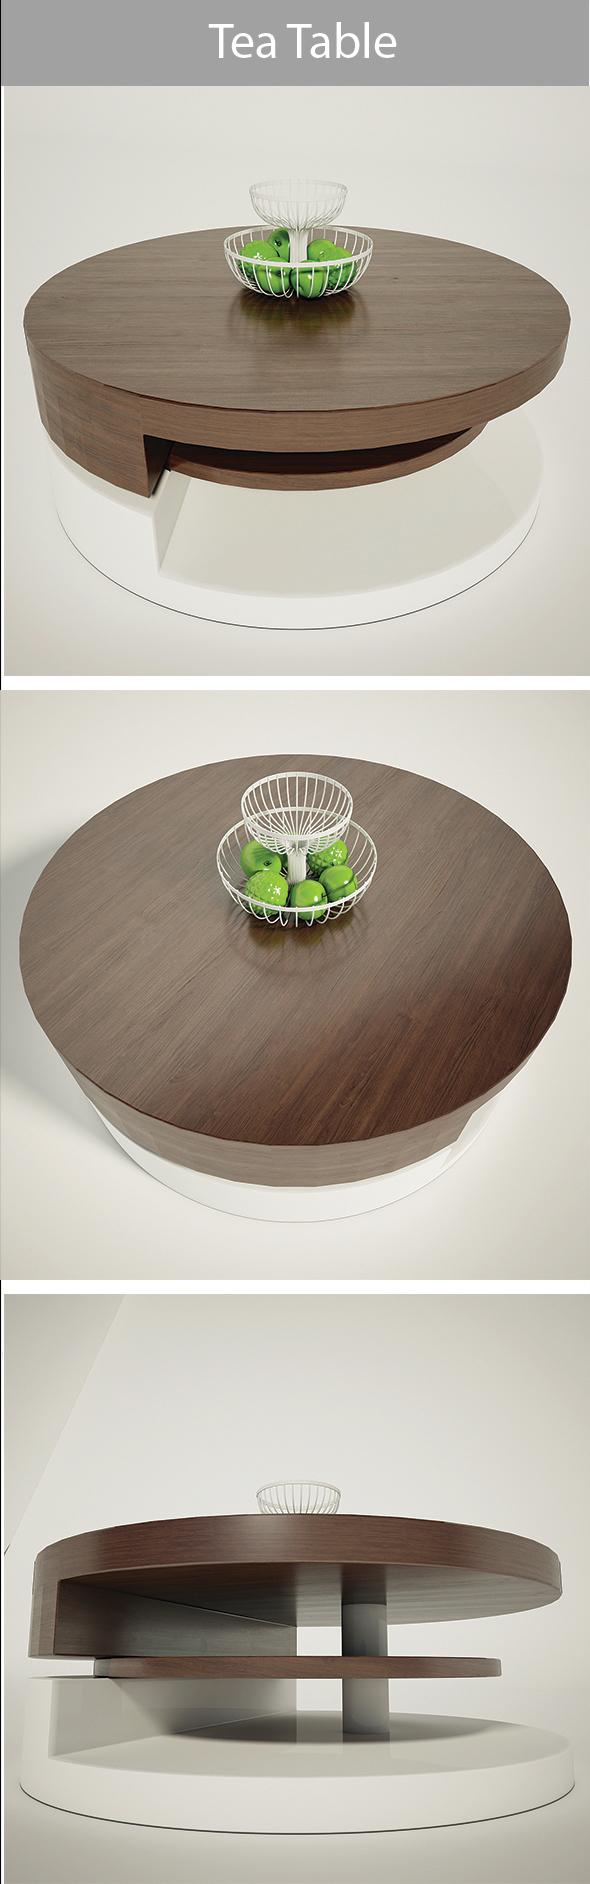 Tea Table - 3DOcean Item for Sale